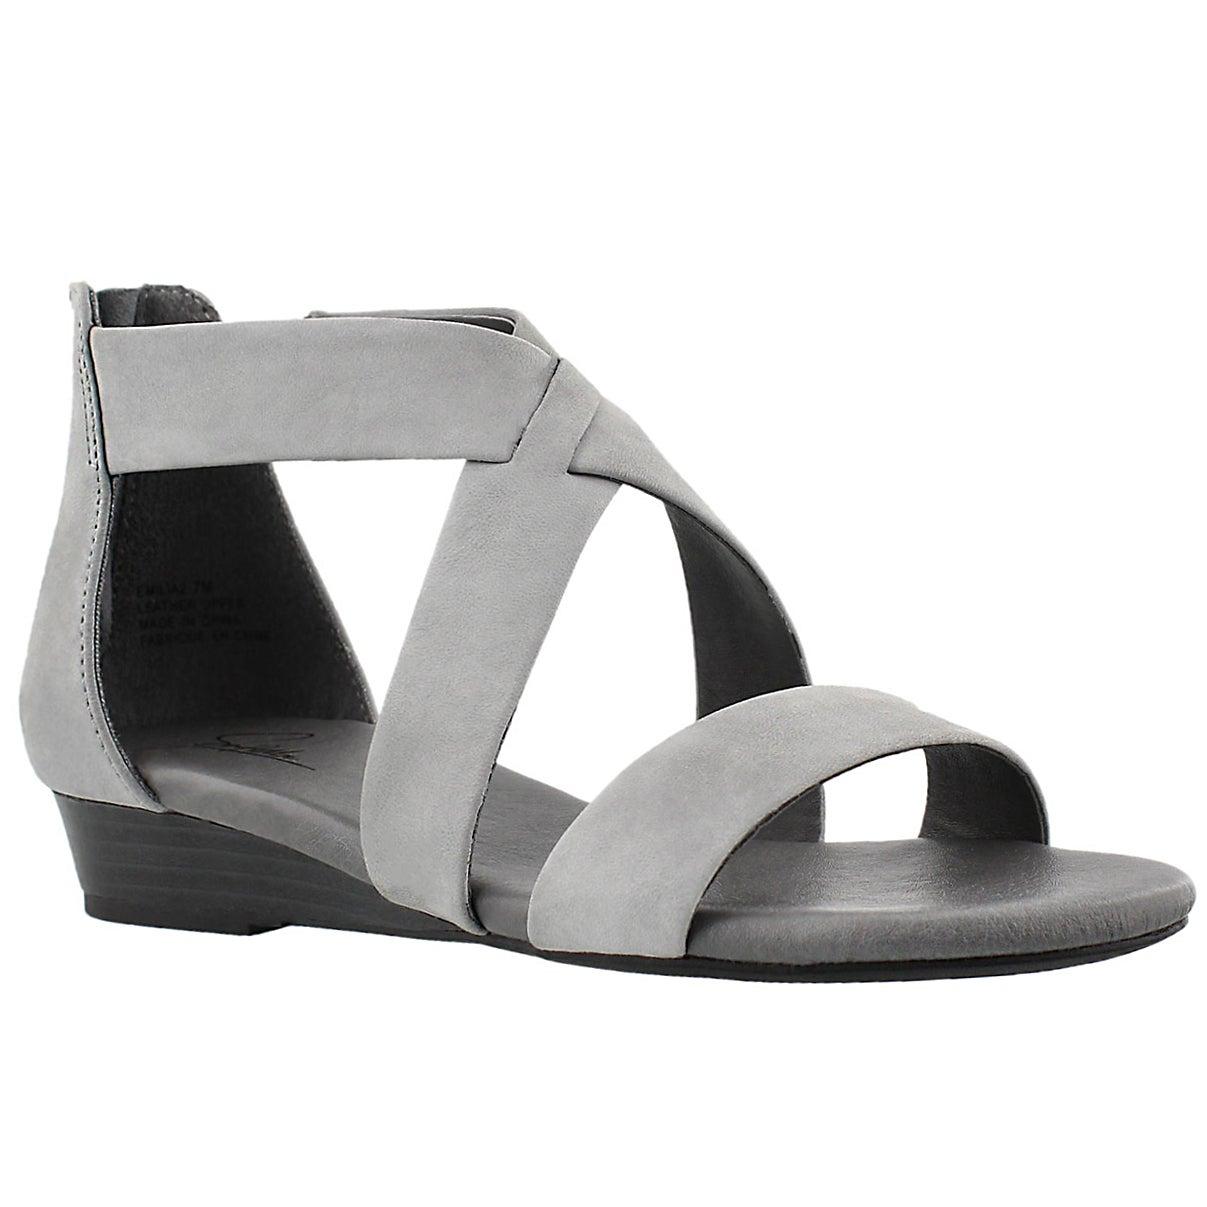 Lds Emilia 2 gry mem. foam sandal